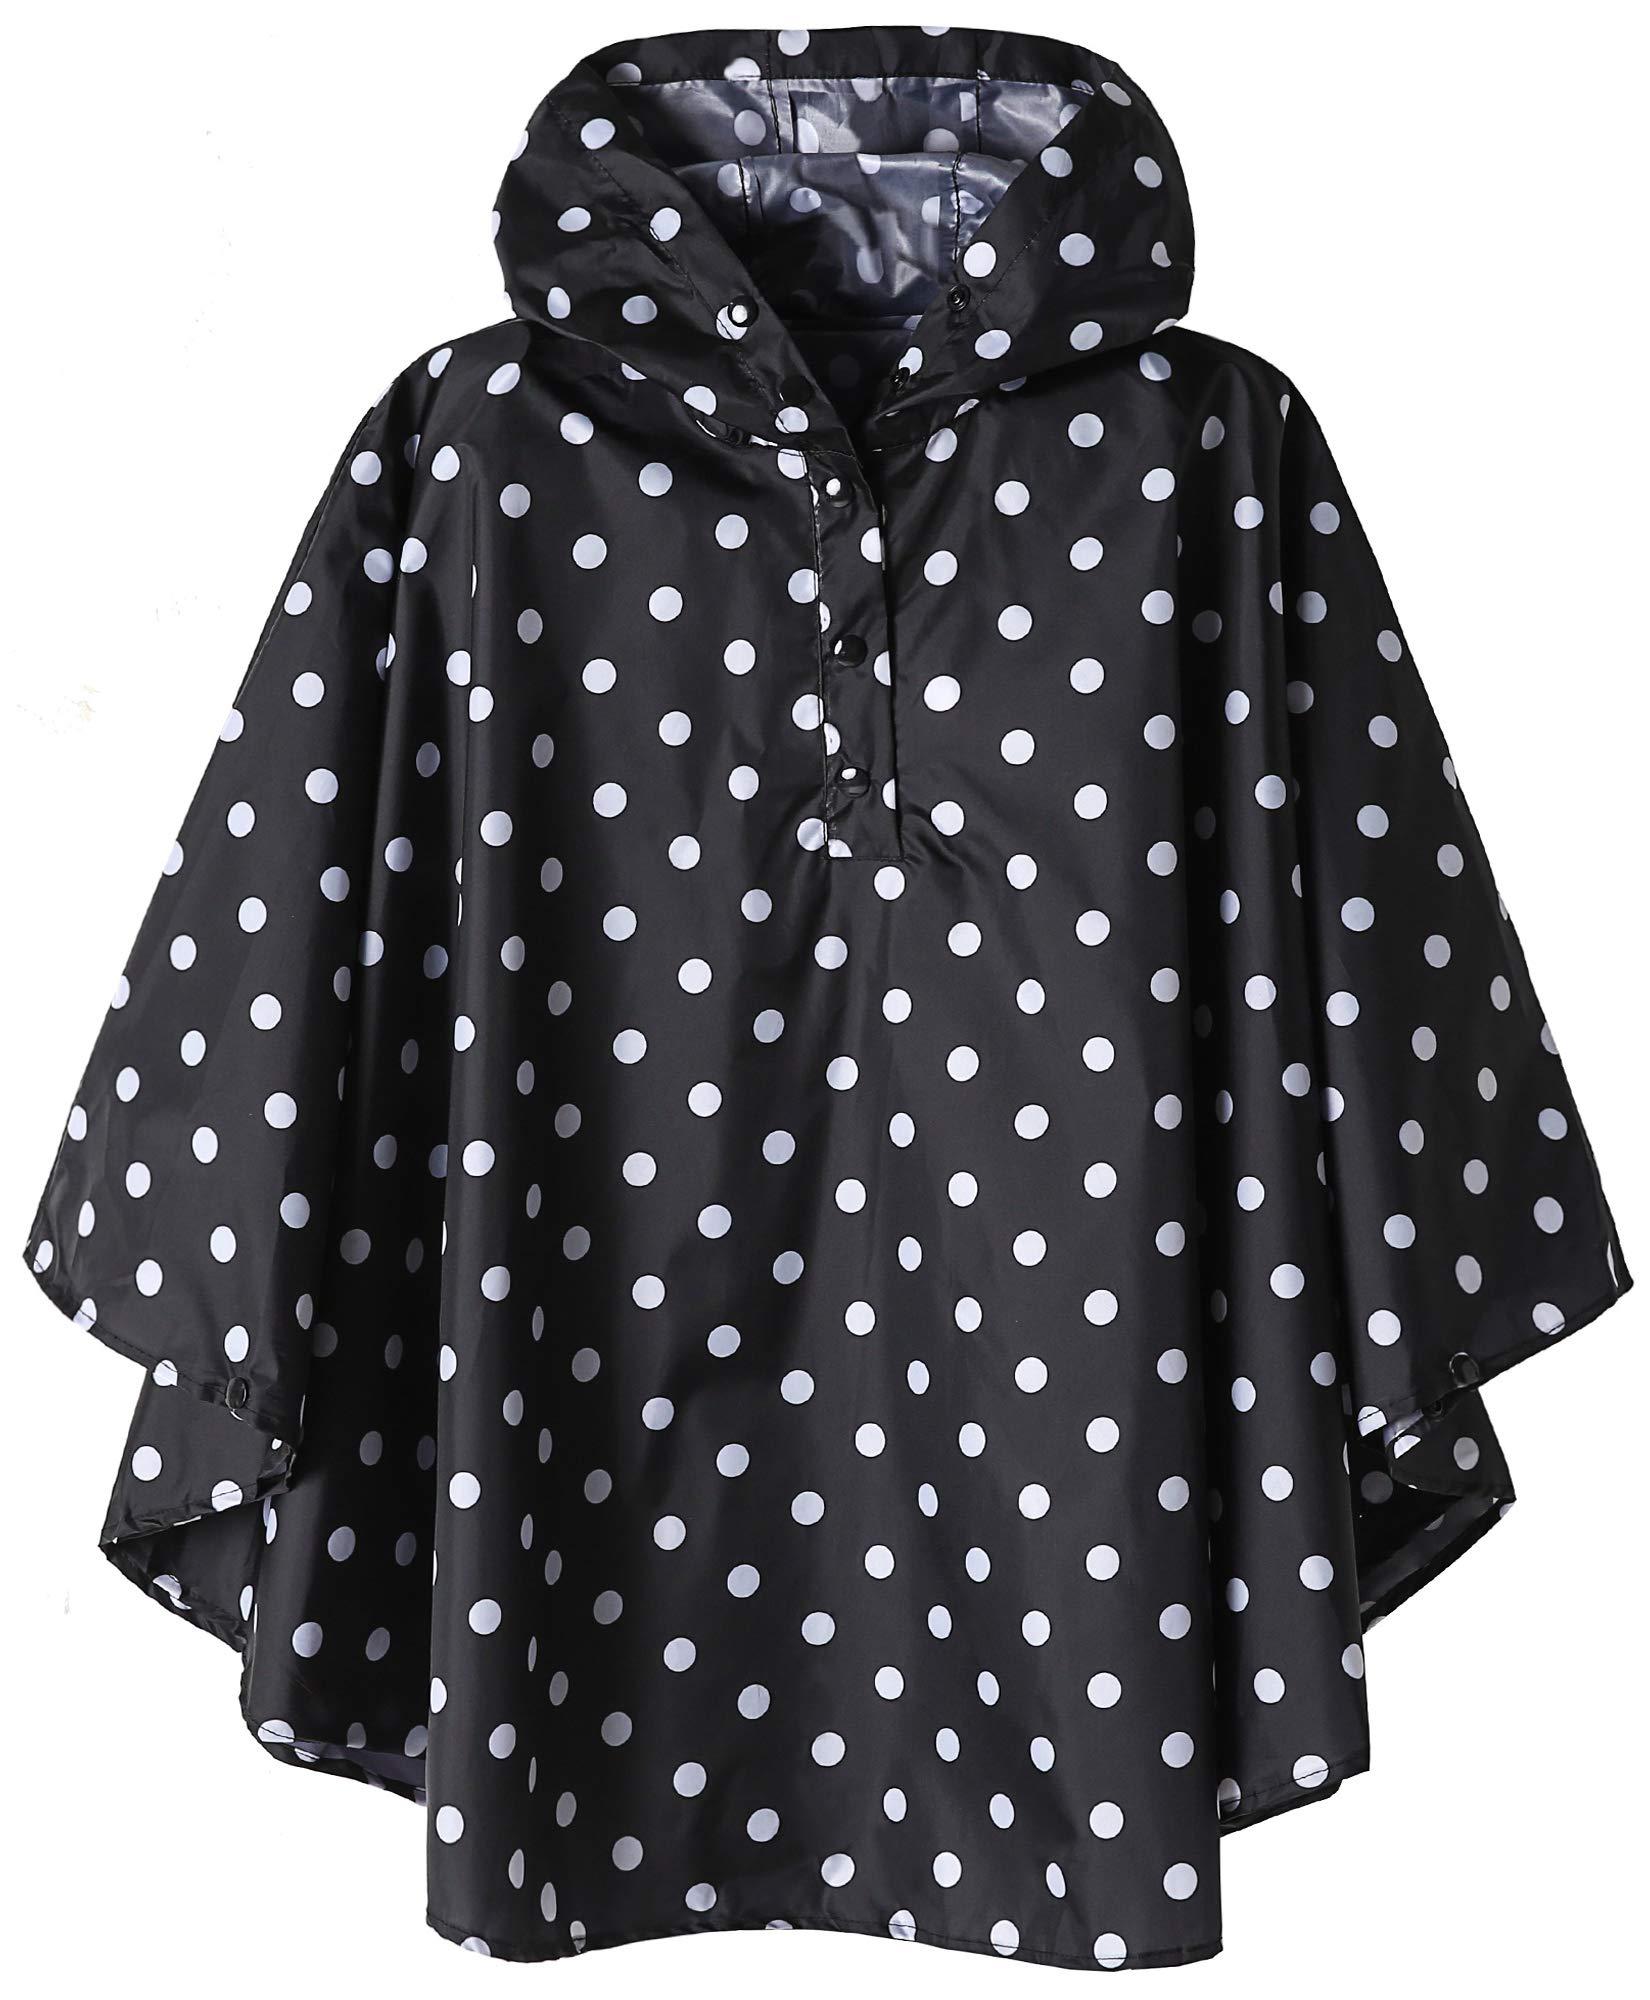 Kids Waterproof Rain Poncho Jacket Black Polka Dot Large by SaphiRose